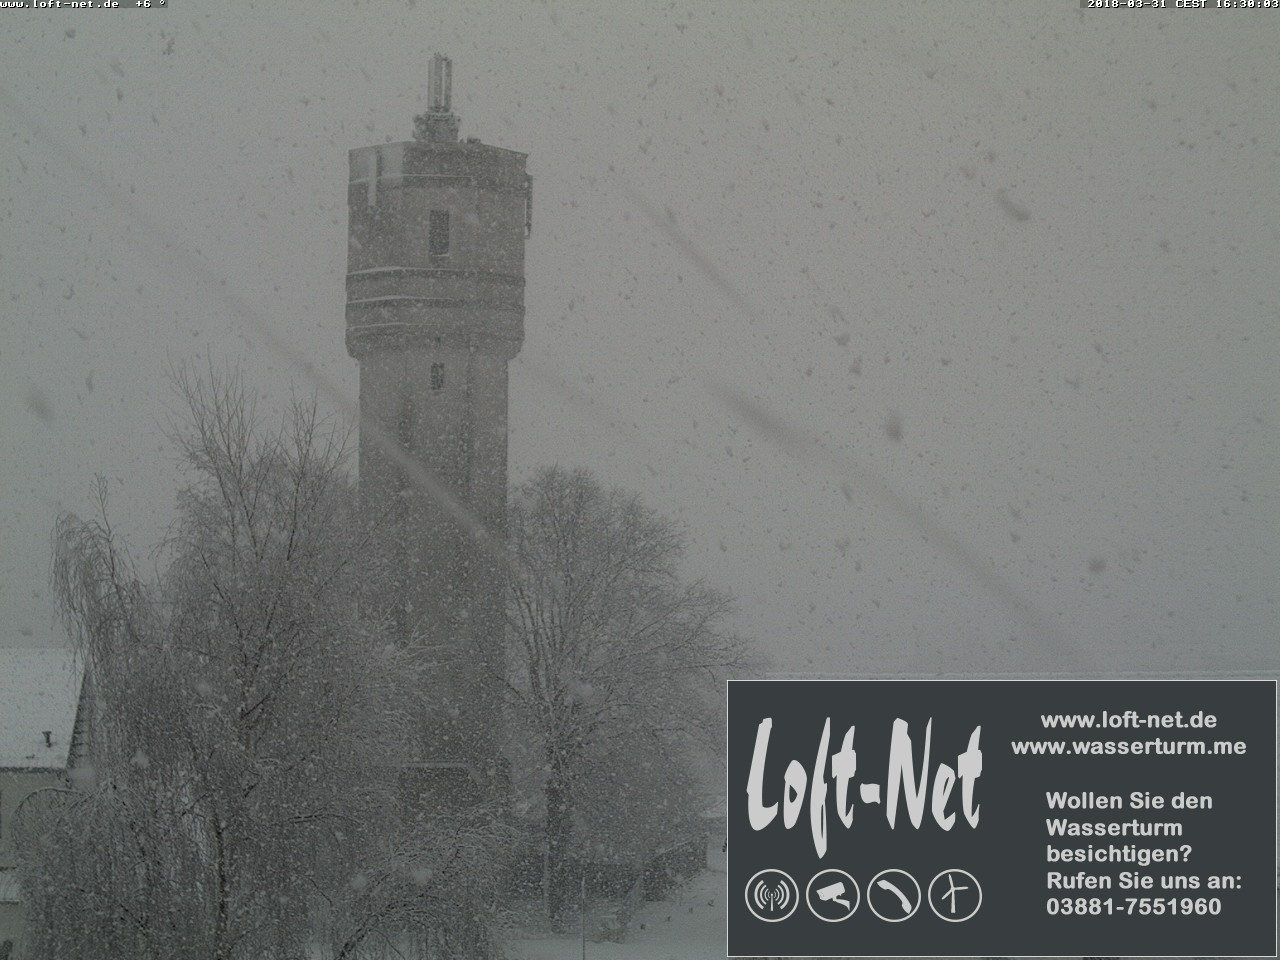 Wetter Grevesmühlen